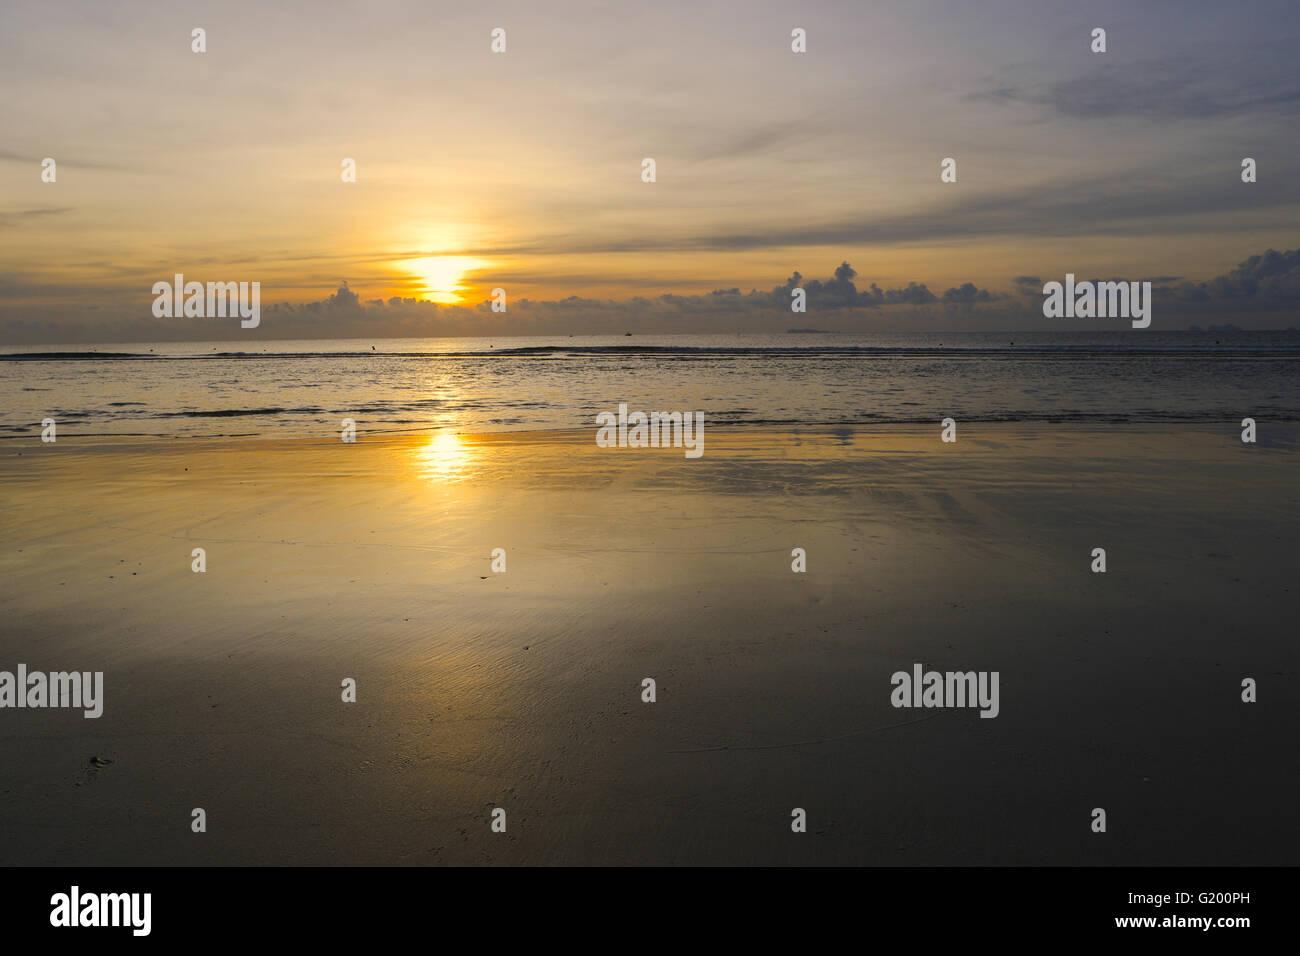 The empty Beach Sunset backdrop. Stock Photo